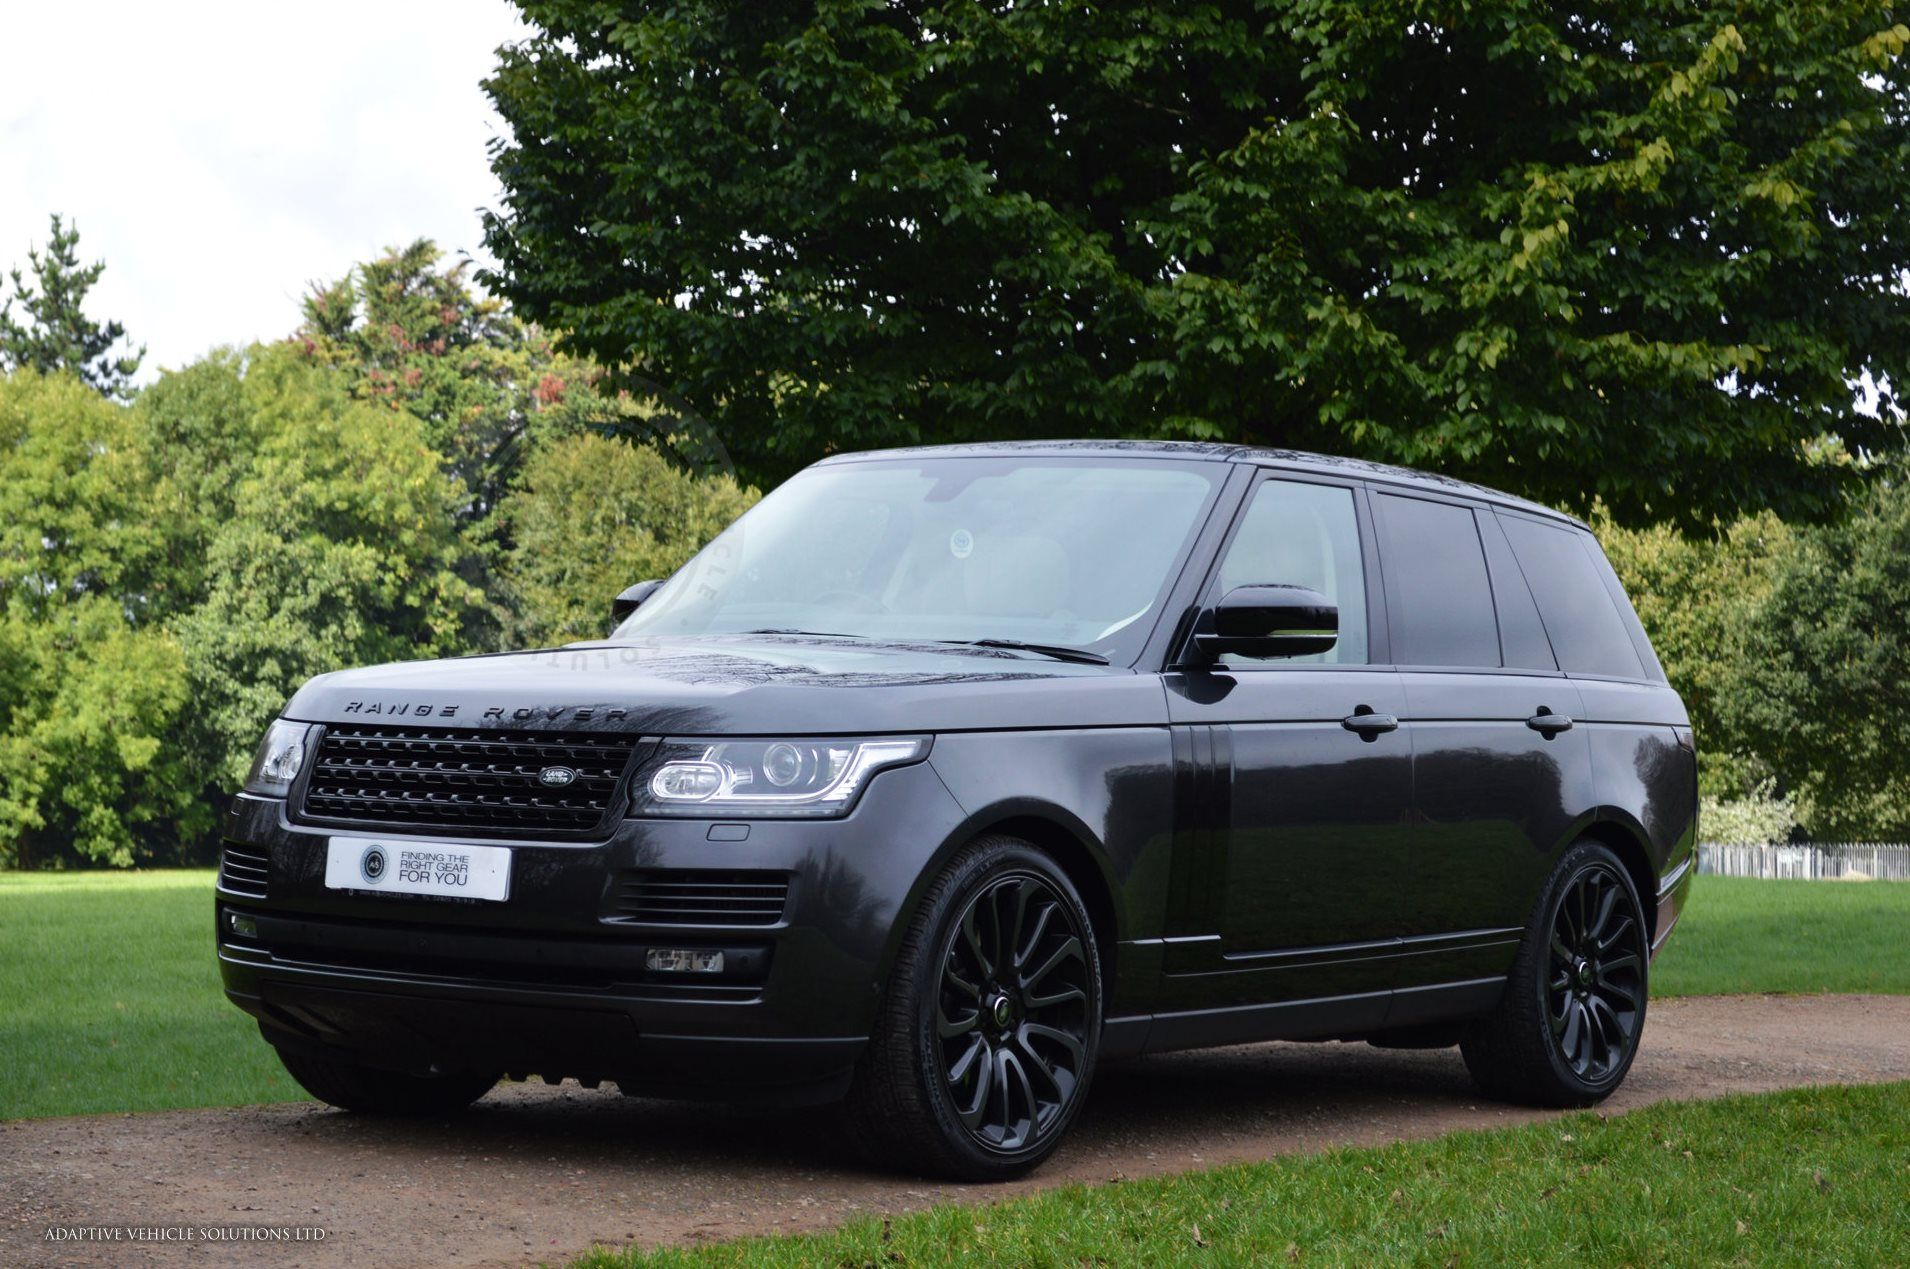 Range Rover Autobiography Petrol Range Rover Range Rover for sale